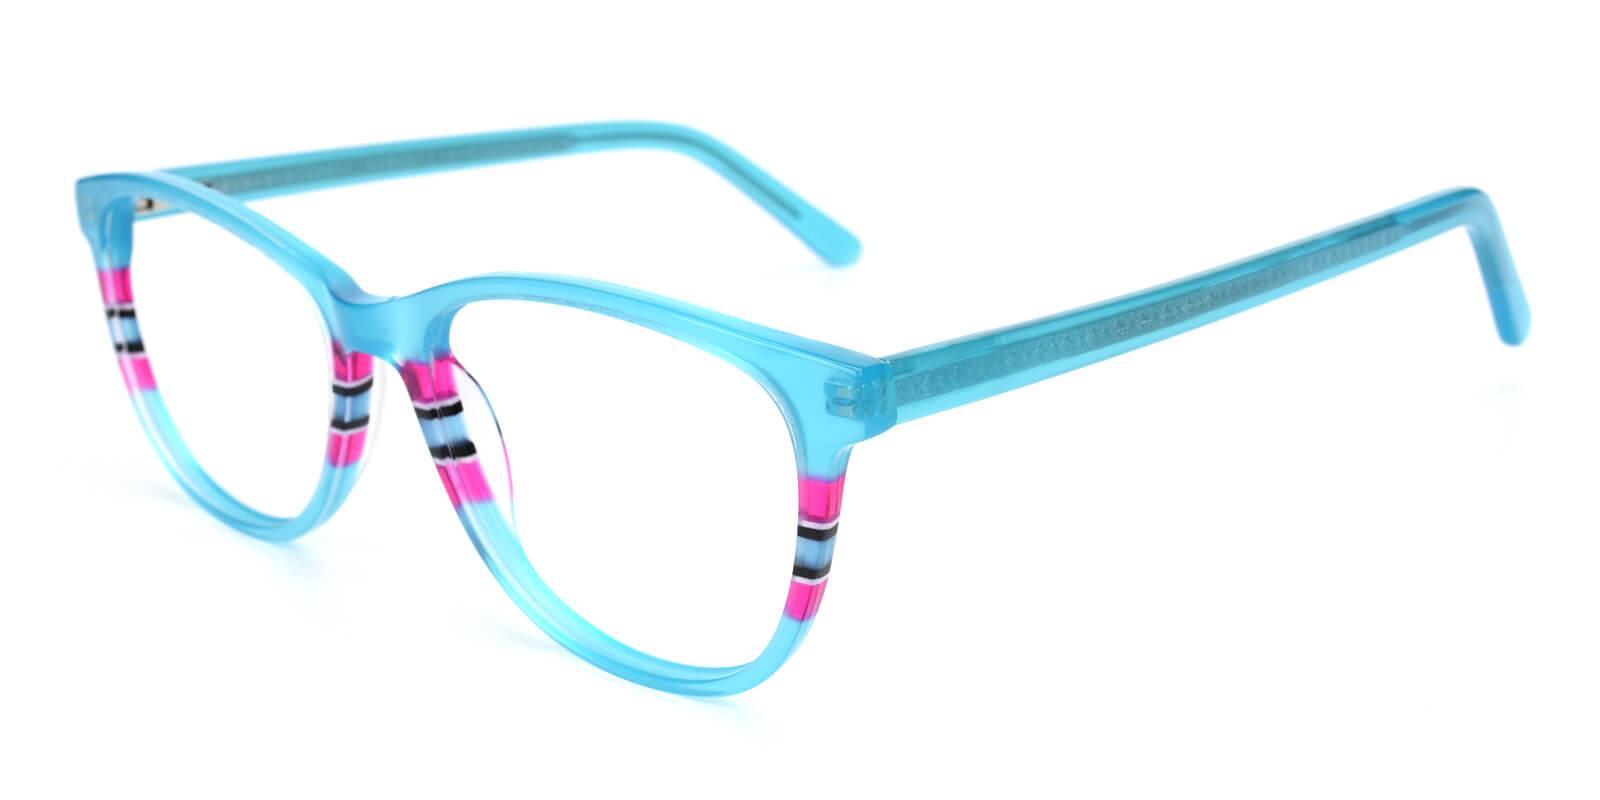 Faithely-Blue--Acetate-Eyeglasses-detail